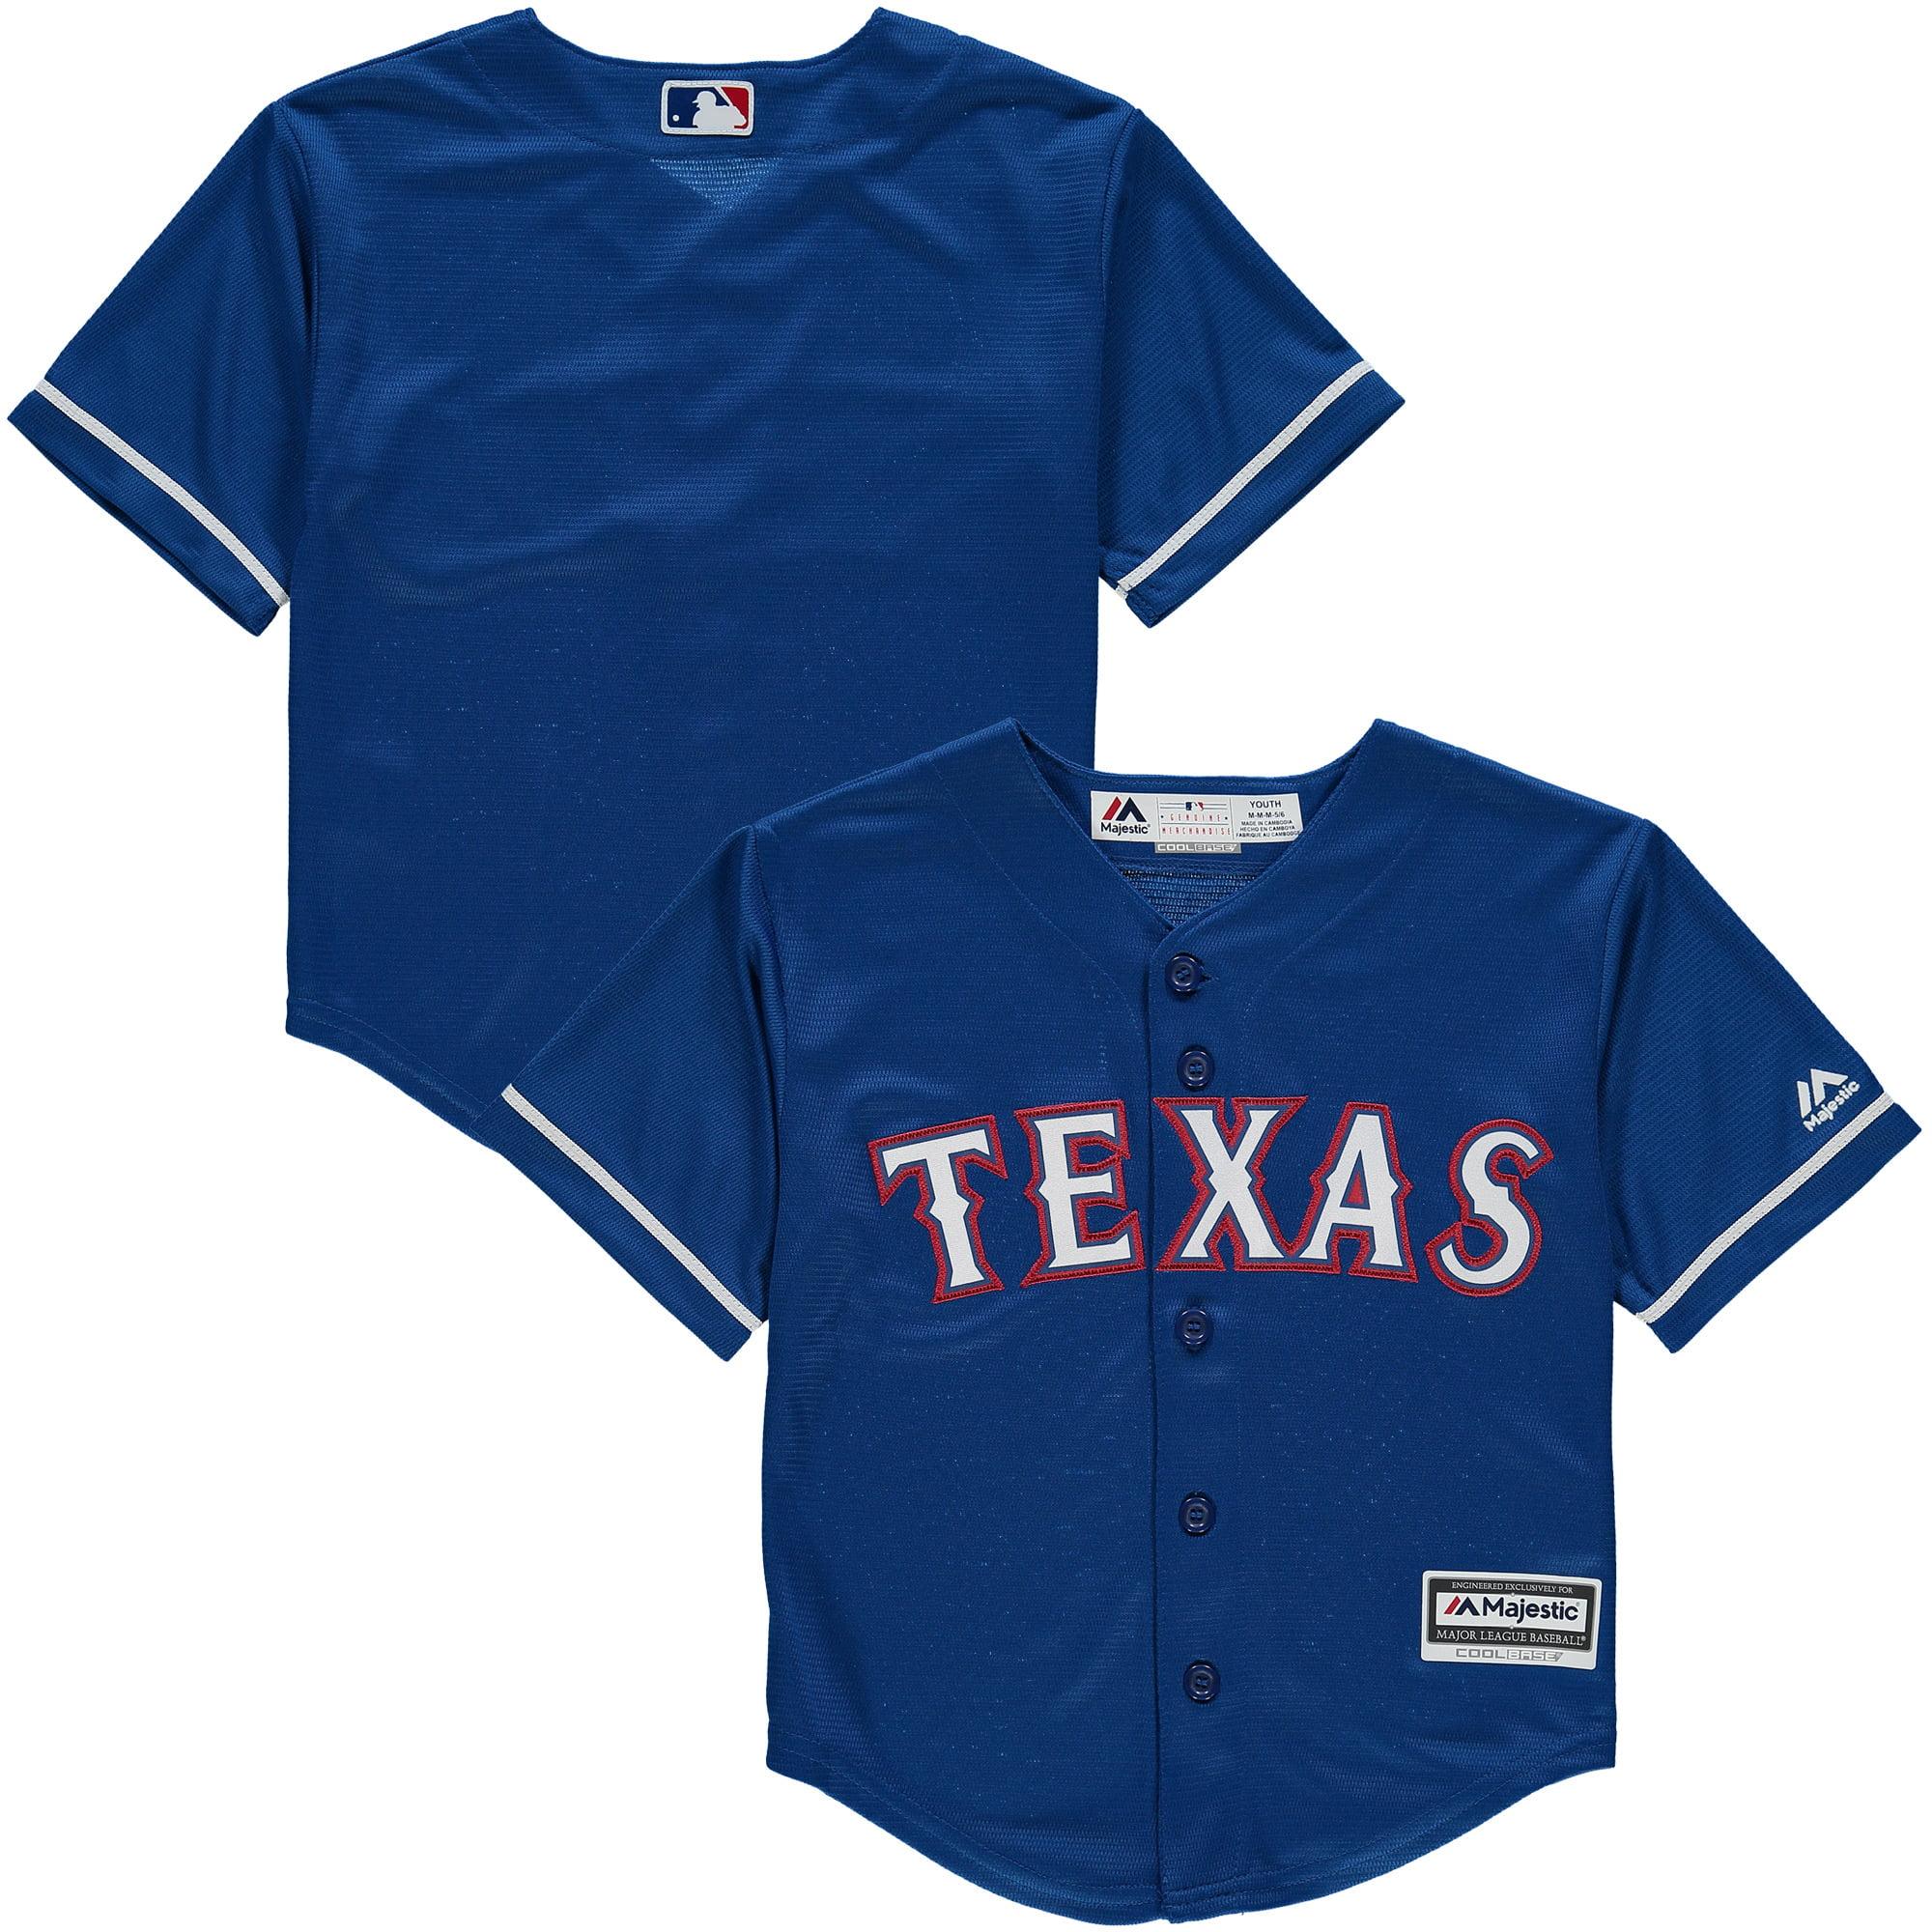 Texas Rangers Majestic Preschool Official Cool Base Team Jersey - Royal